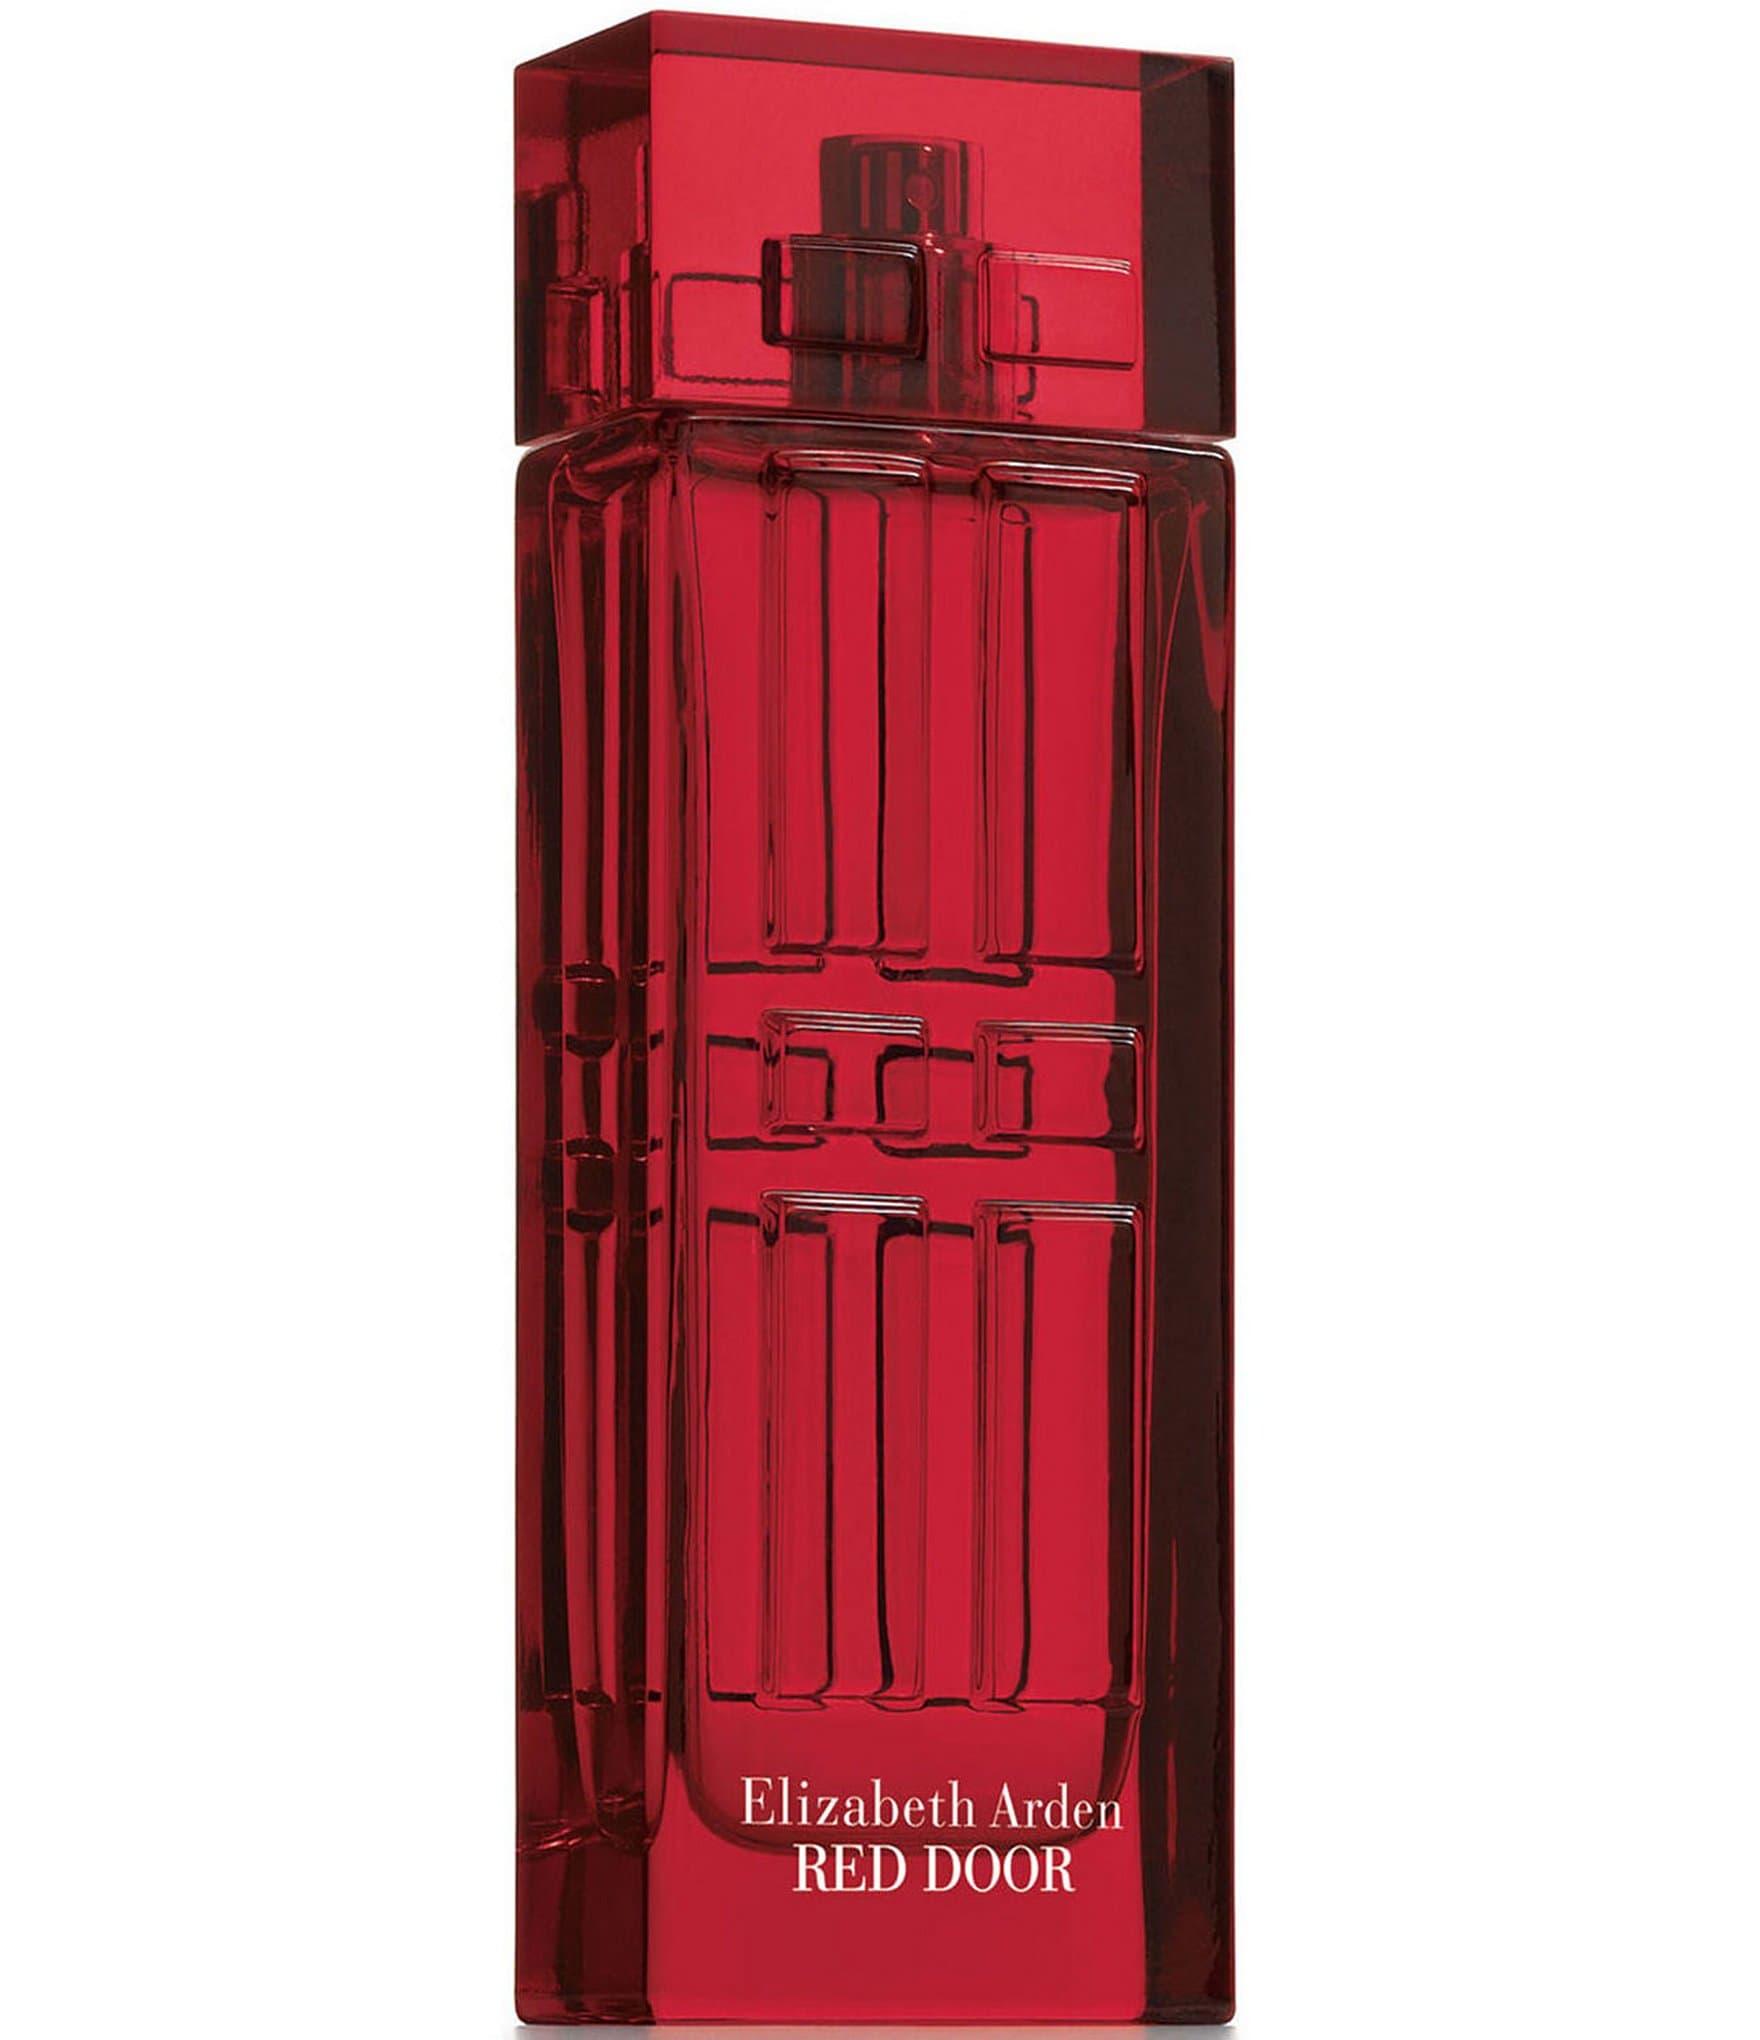 Elizabeth Arden Red Door Eau De Parfum Spray Dillards